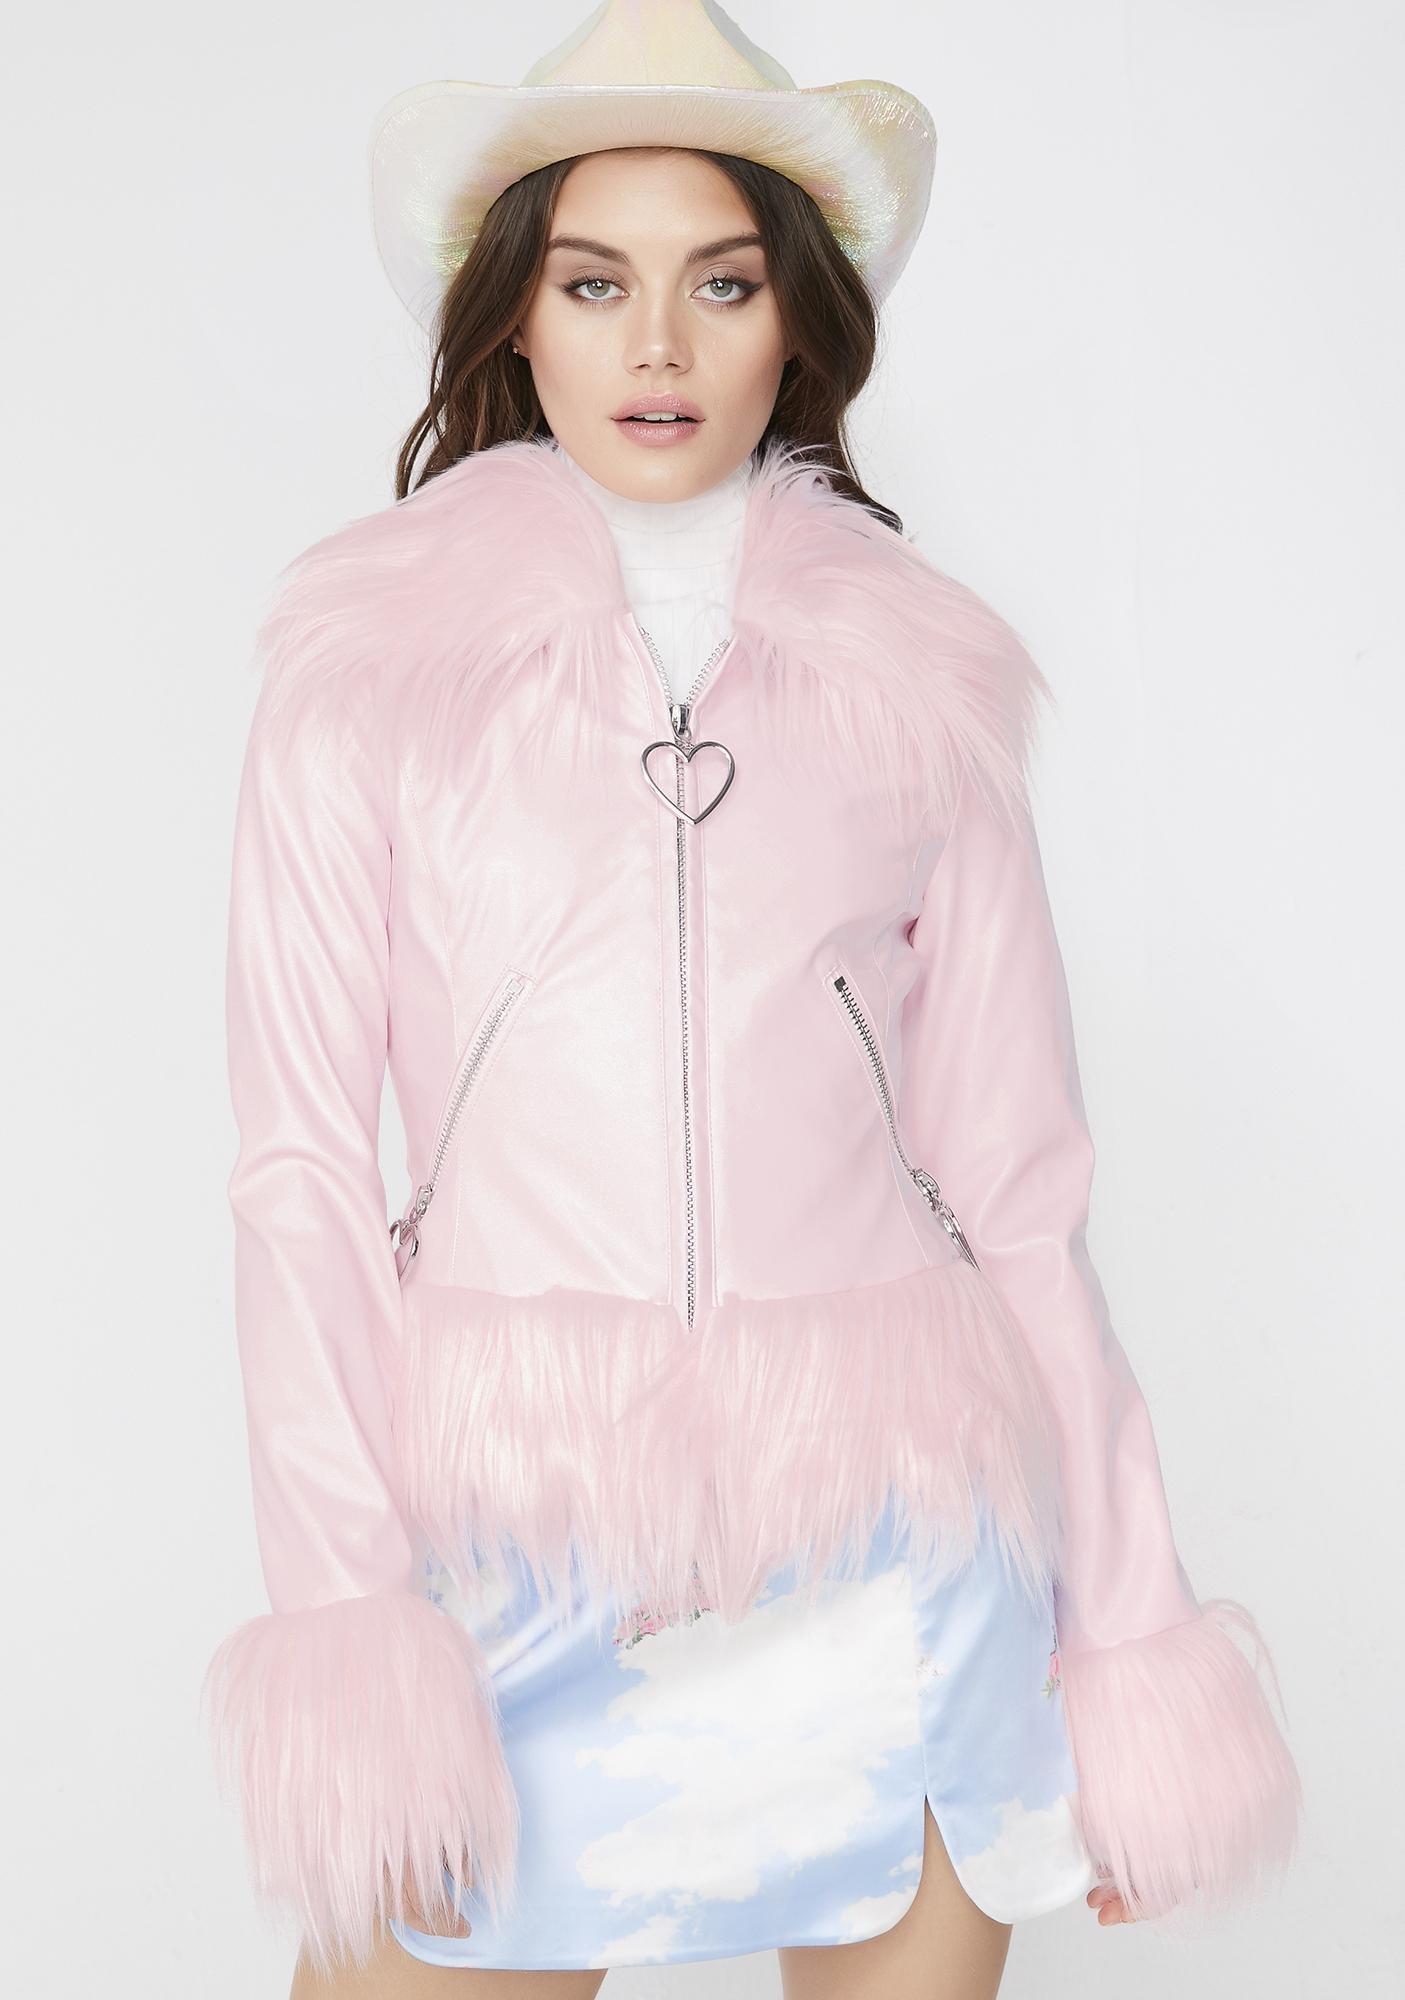 Sugar Thrillz Princess Bubbleyum Vegan Leather Jacket